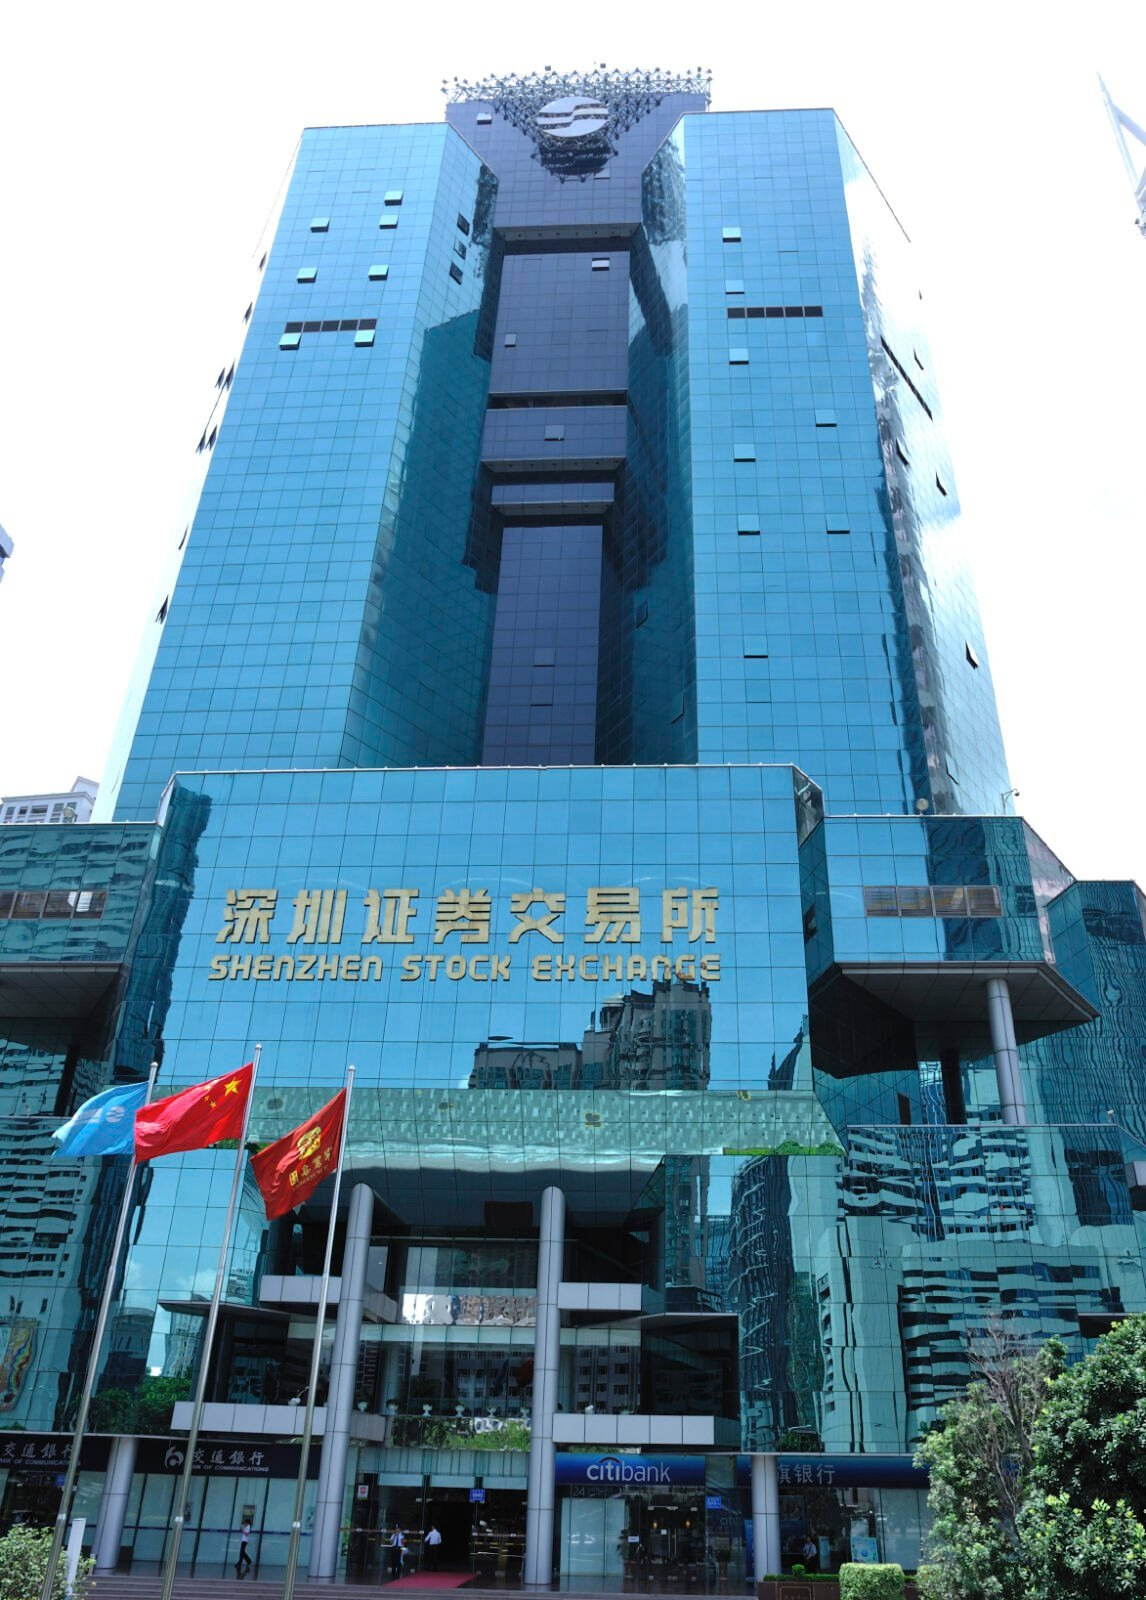 Shenzen Stock Echange Building